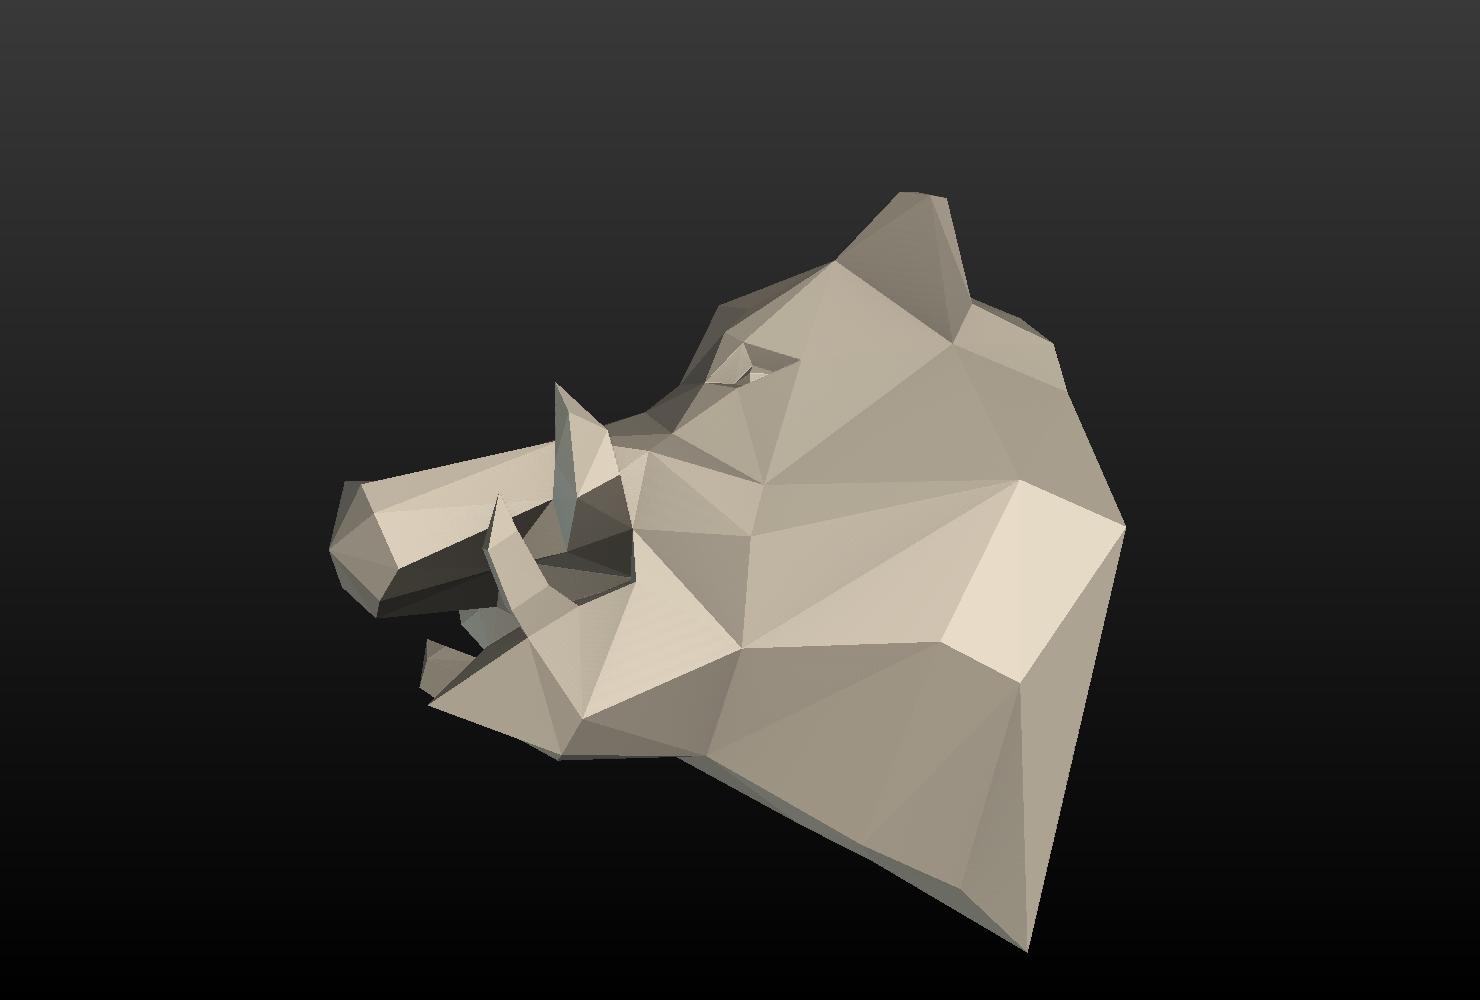 Boars_LP_Head-0011.png Download 3DS file Boar Head Low Poly • 3D print model, Skazok